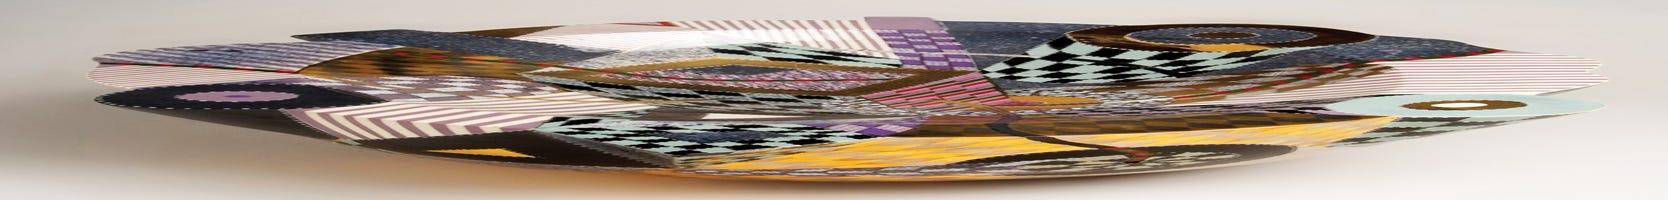 Through 2/28: 'Fusion' at ASU Art Museum Brickyard